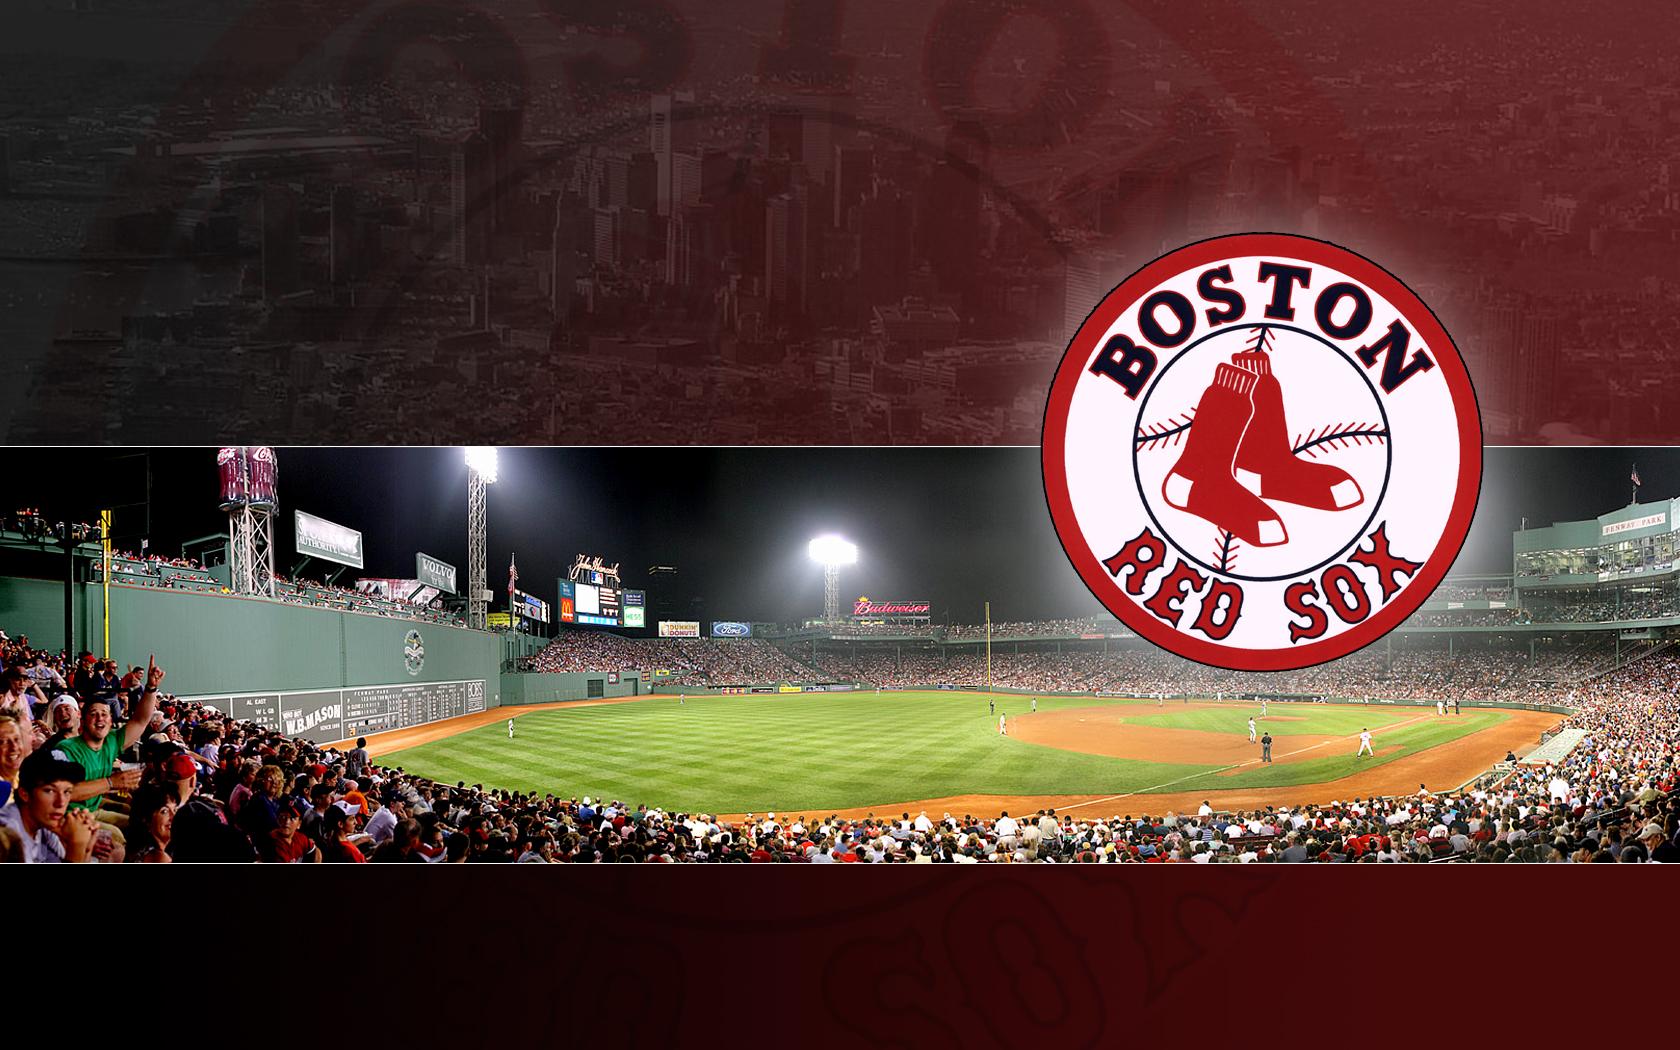 boston red sox wallpaper by crazydi4mond on deviantart